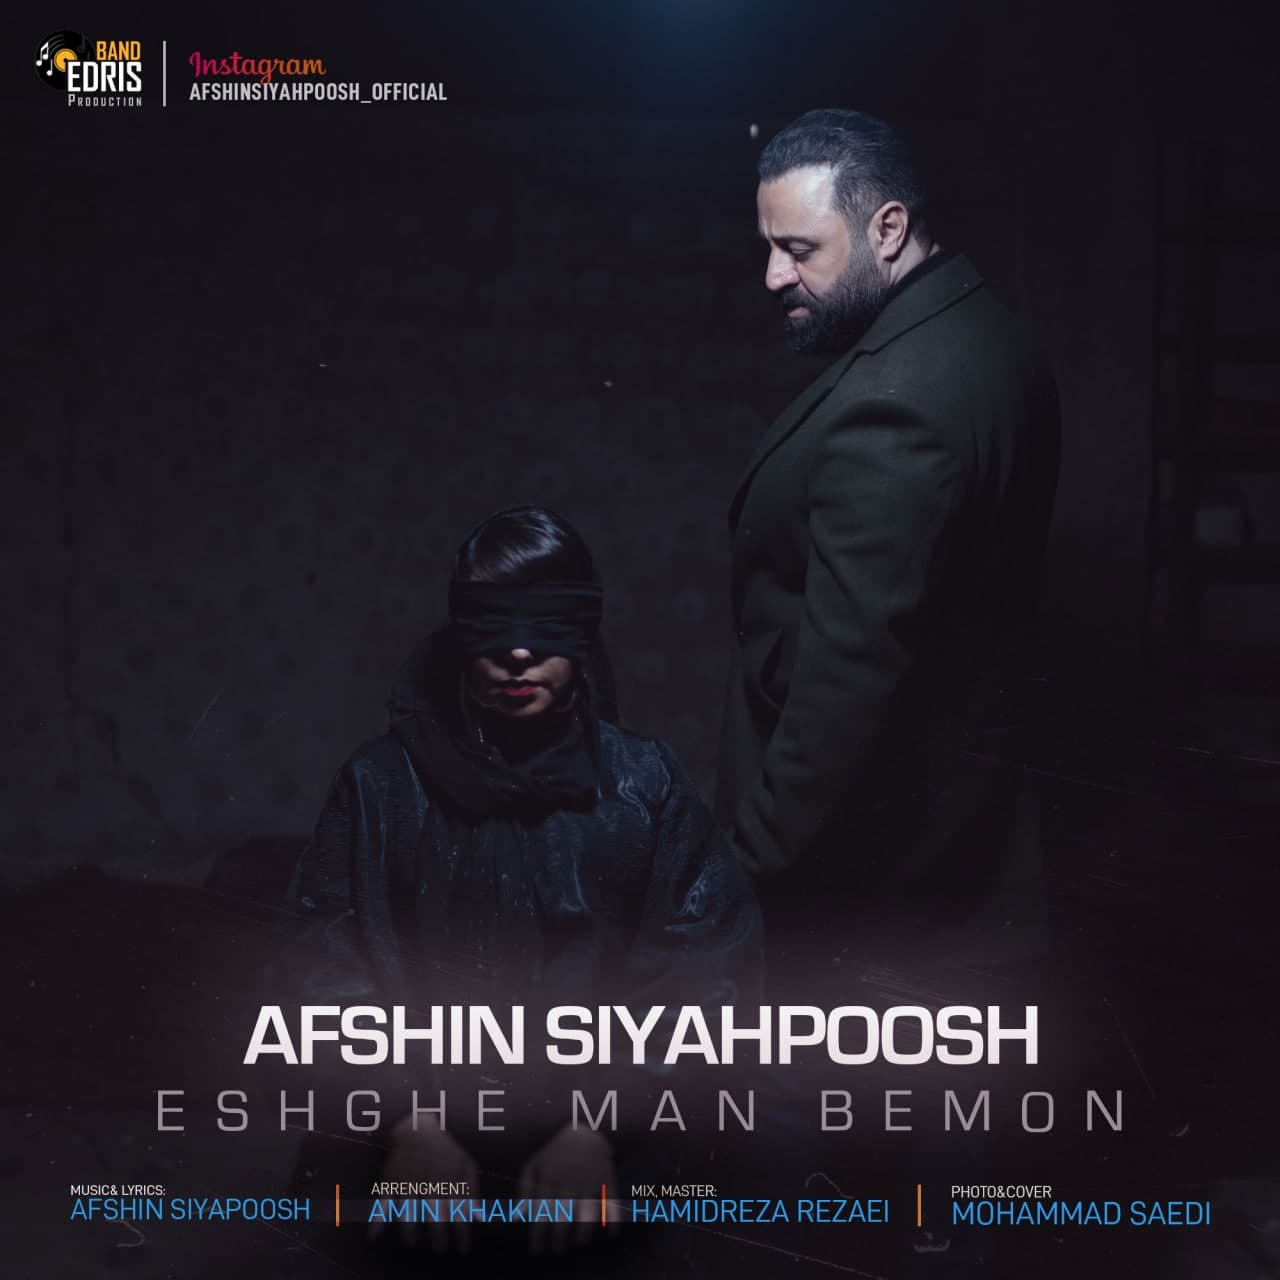 Afshin Siyahpoosh – Eshghe Man Bemon